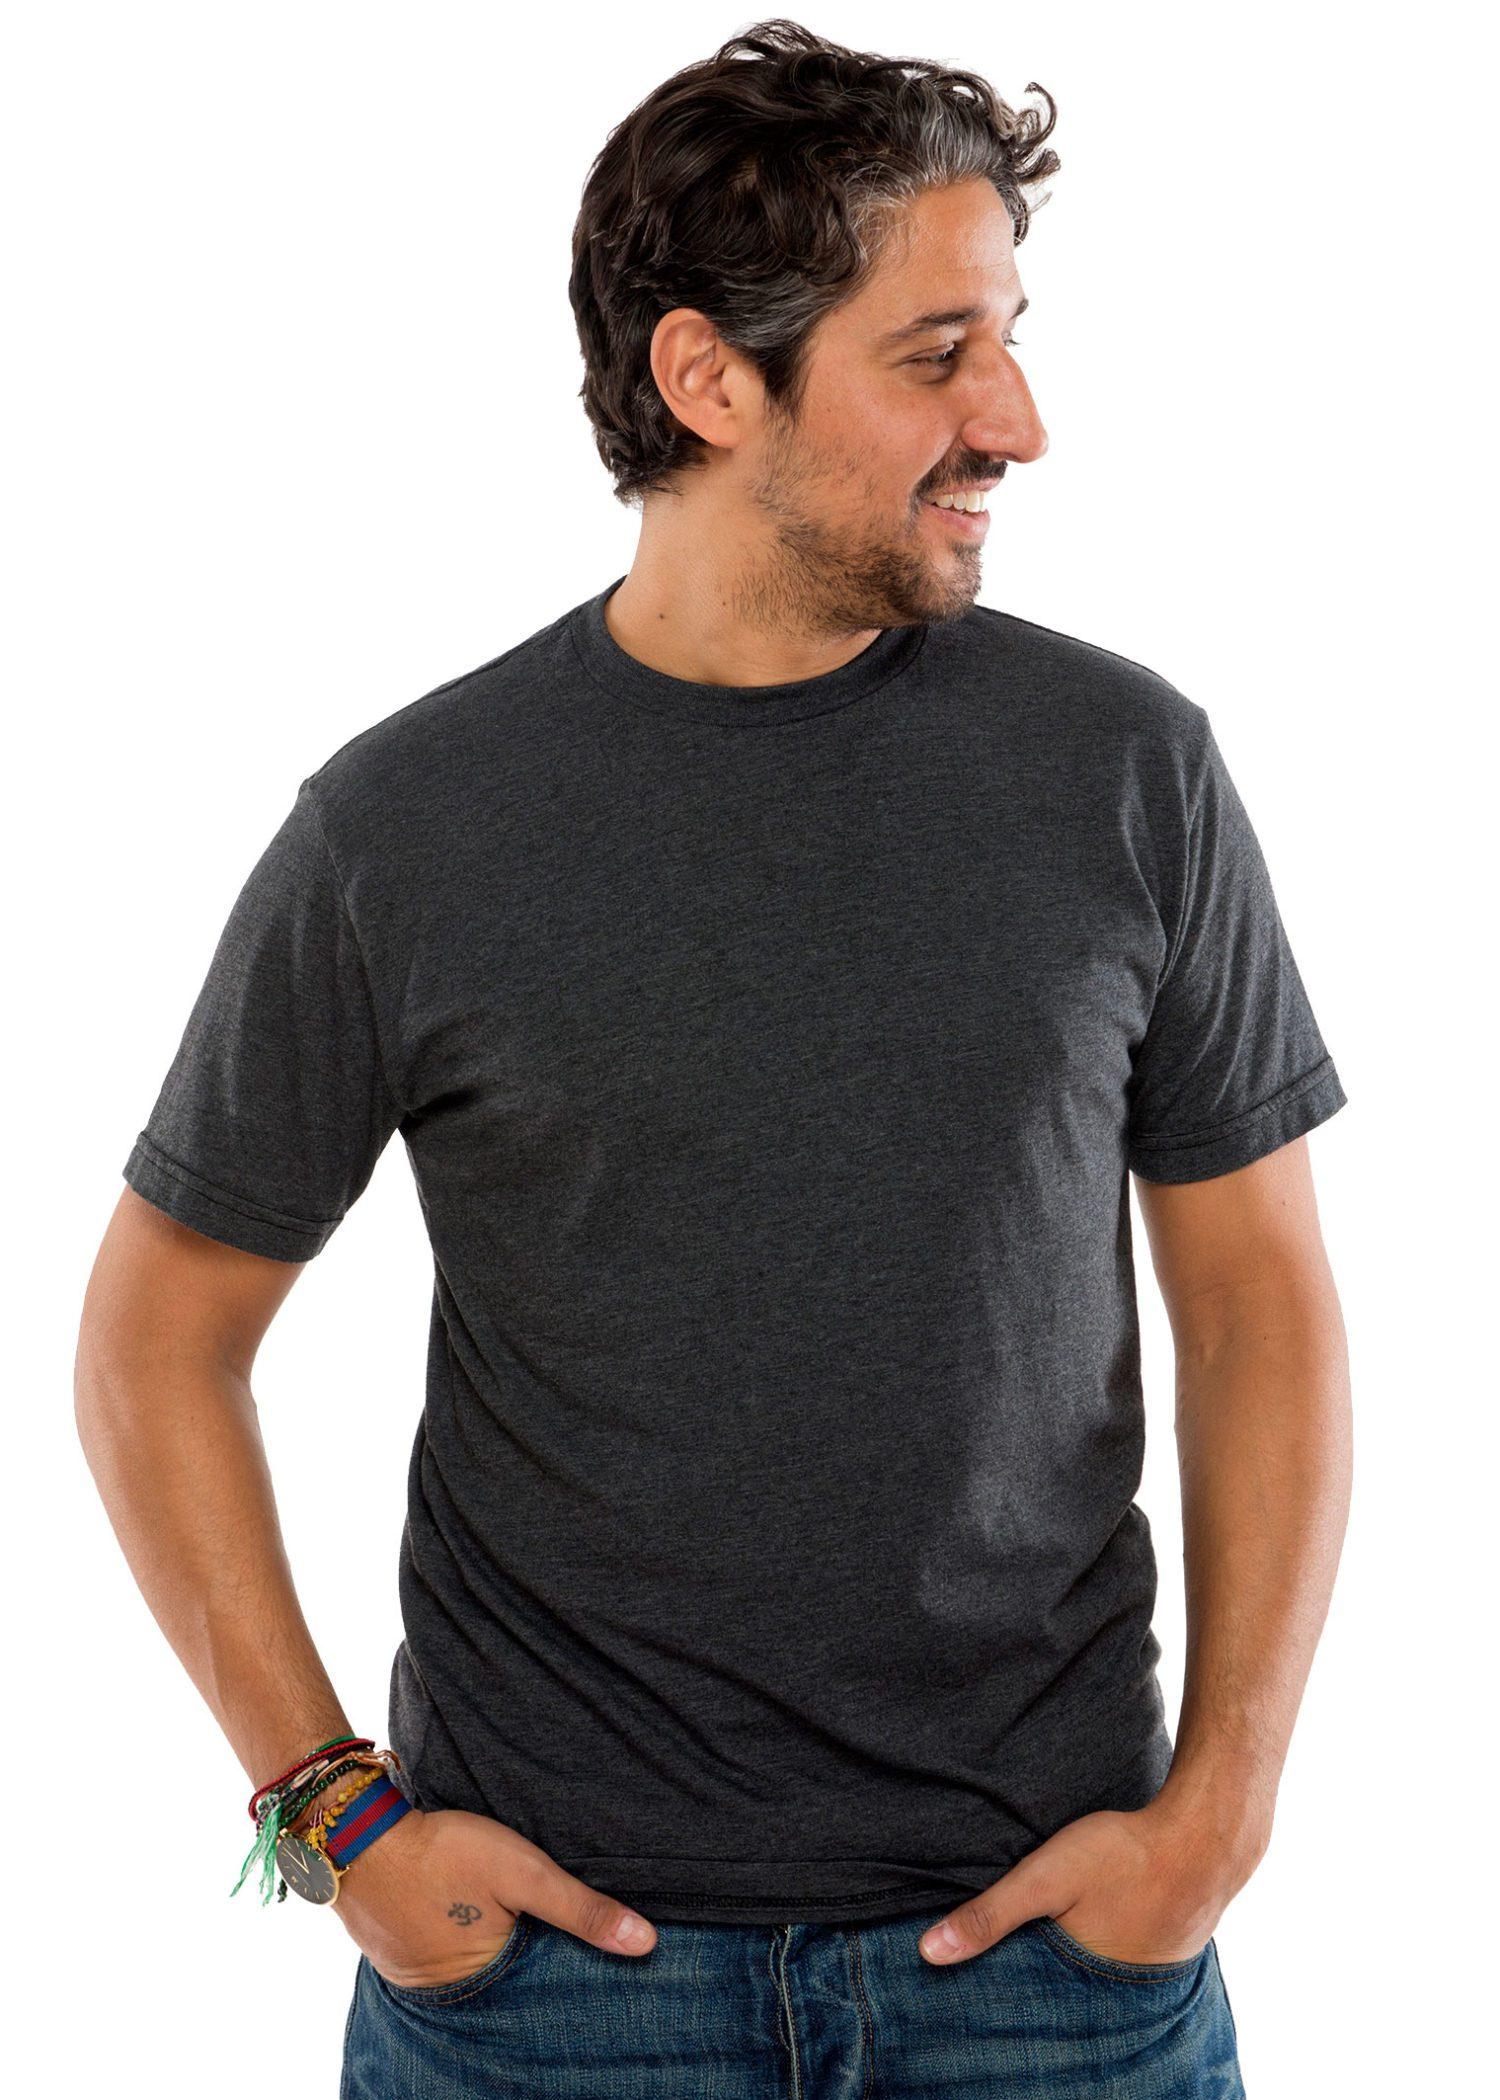 Heathered Crew Short Sleeve T-Shirt in Black Heather